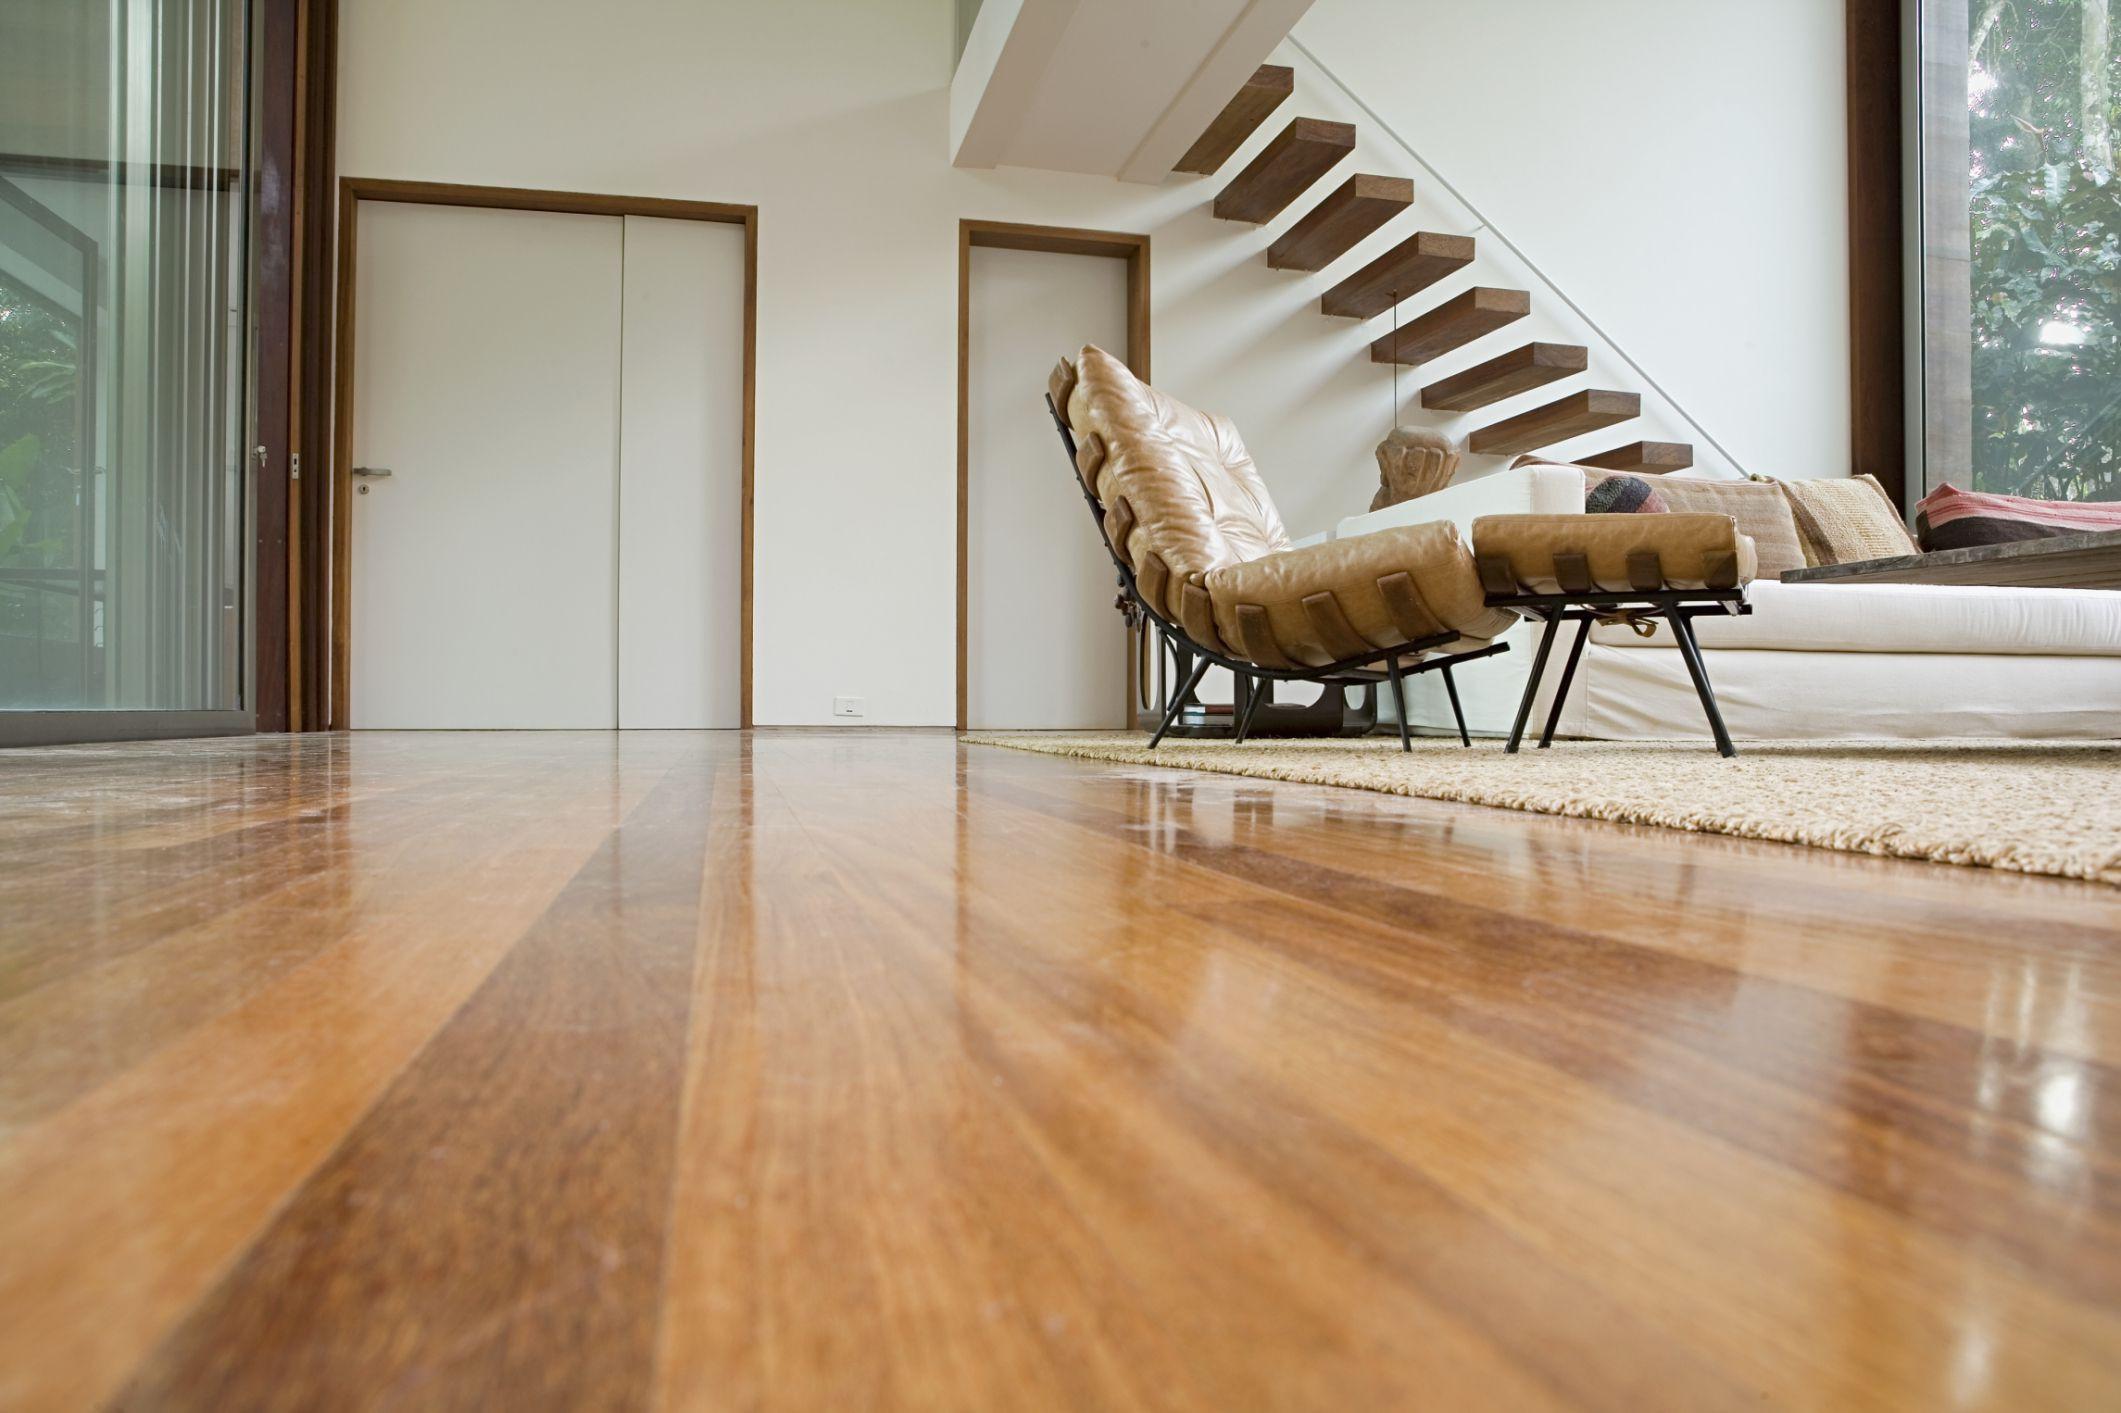 resurfacing prefinished hardwood floors of engineered wood flooring vs solid wood flooring regarding 200571260 001 highres 56a49dec5f9b58b7d0d7dc1e